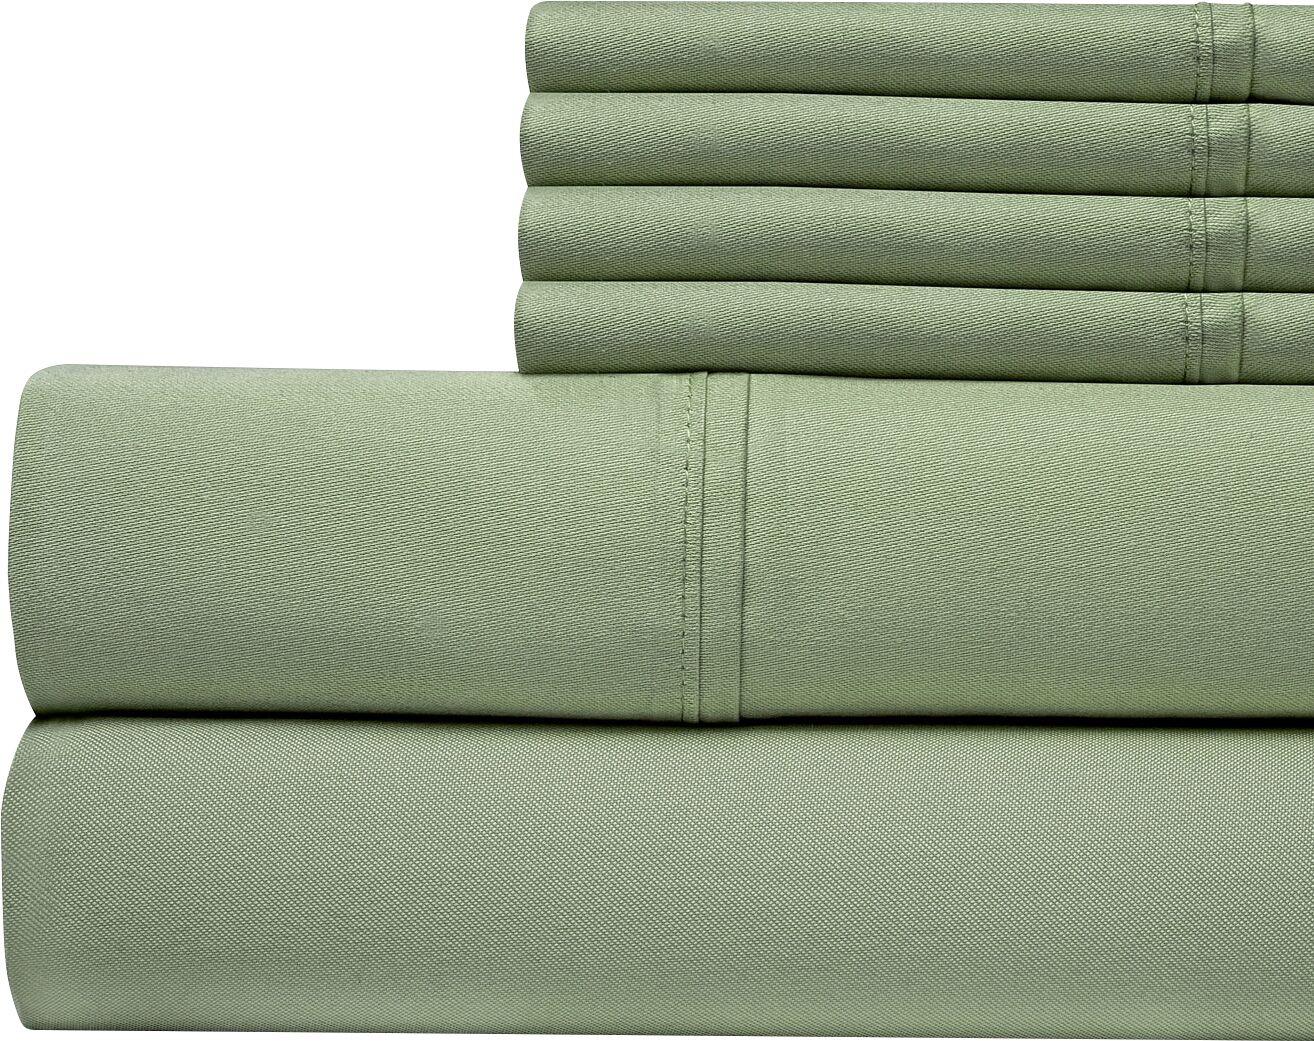 400 Thread Count Cotton Sateen Sheet Set Size: Queen, Color: Sage